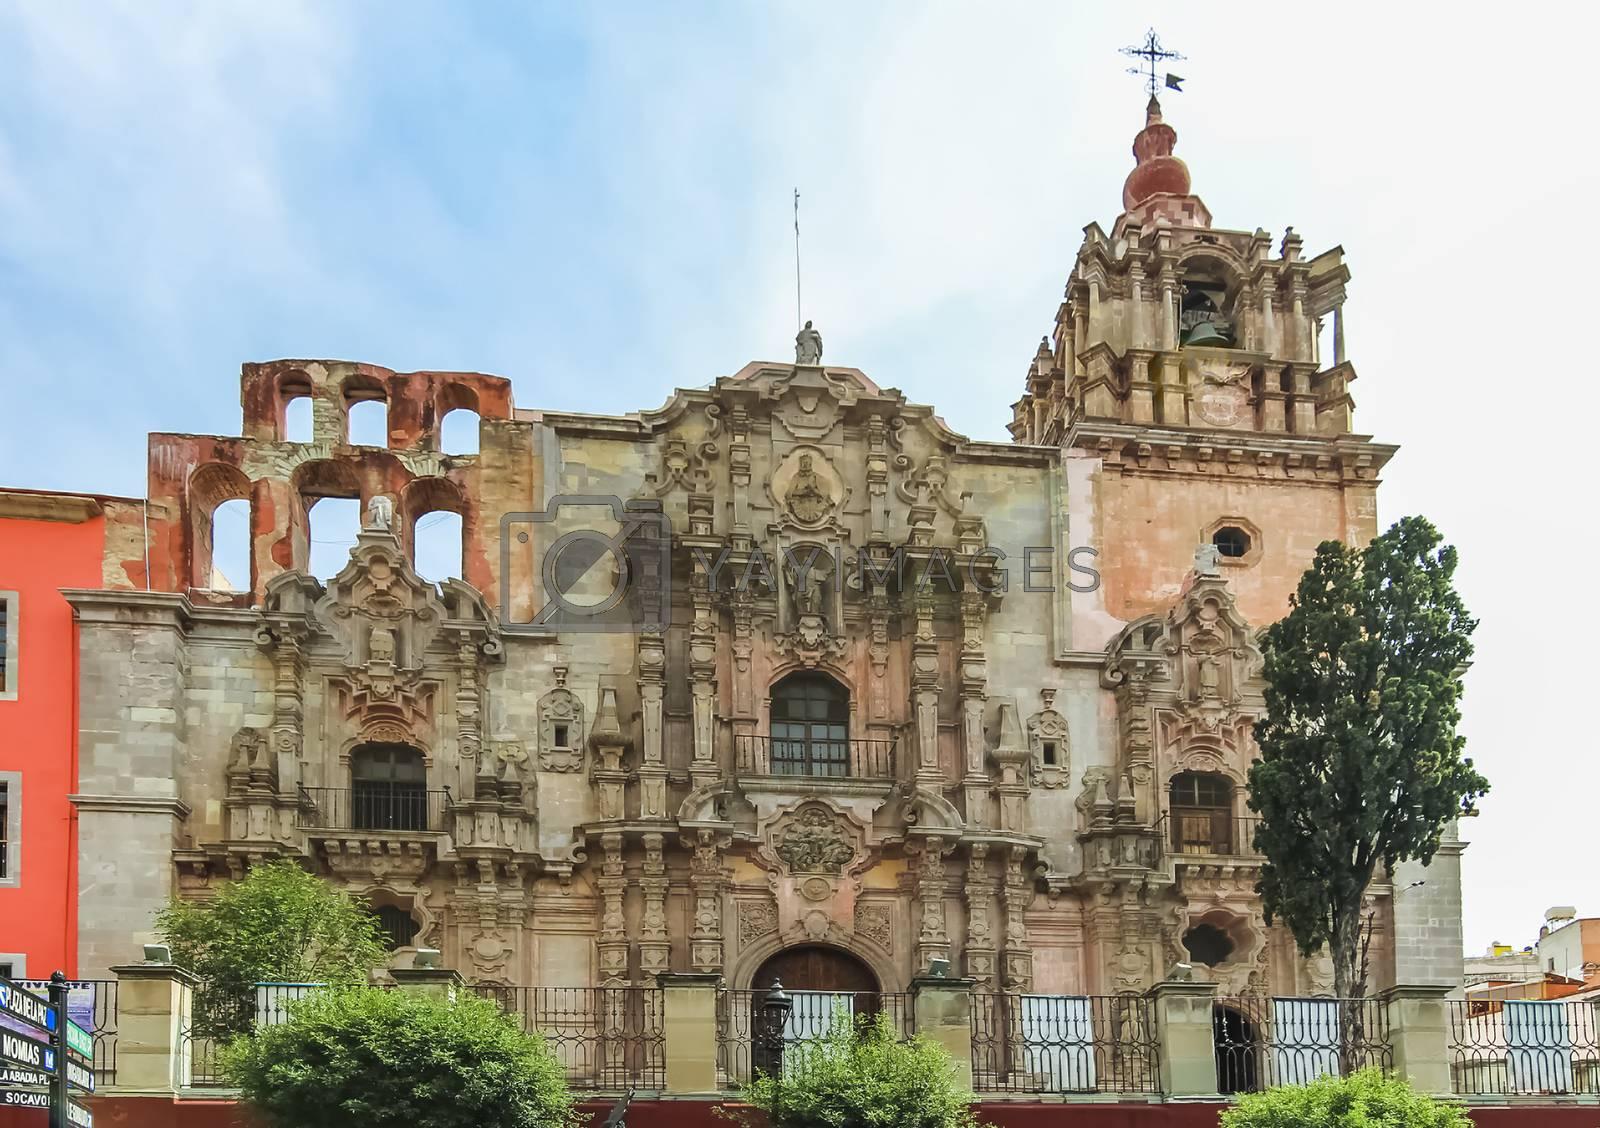 Facade of the Temple of the Company of Jesus commonly known as La Compania in Guanajuato City, Mexico